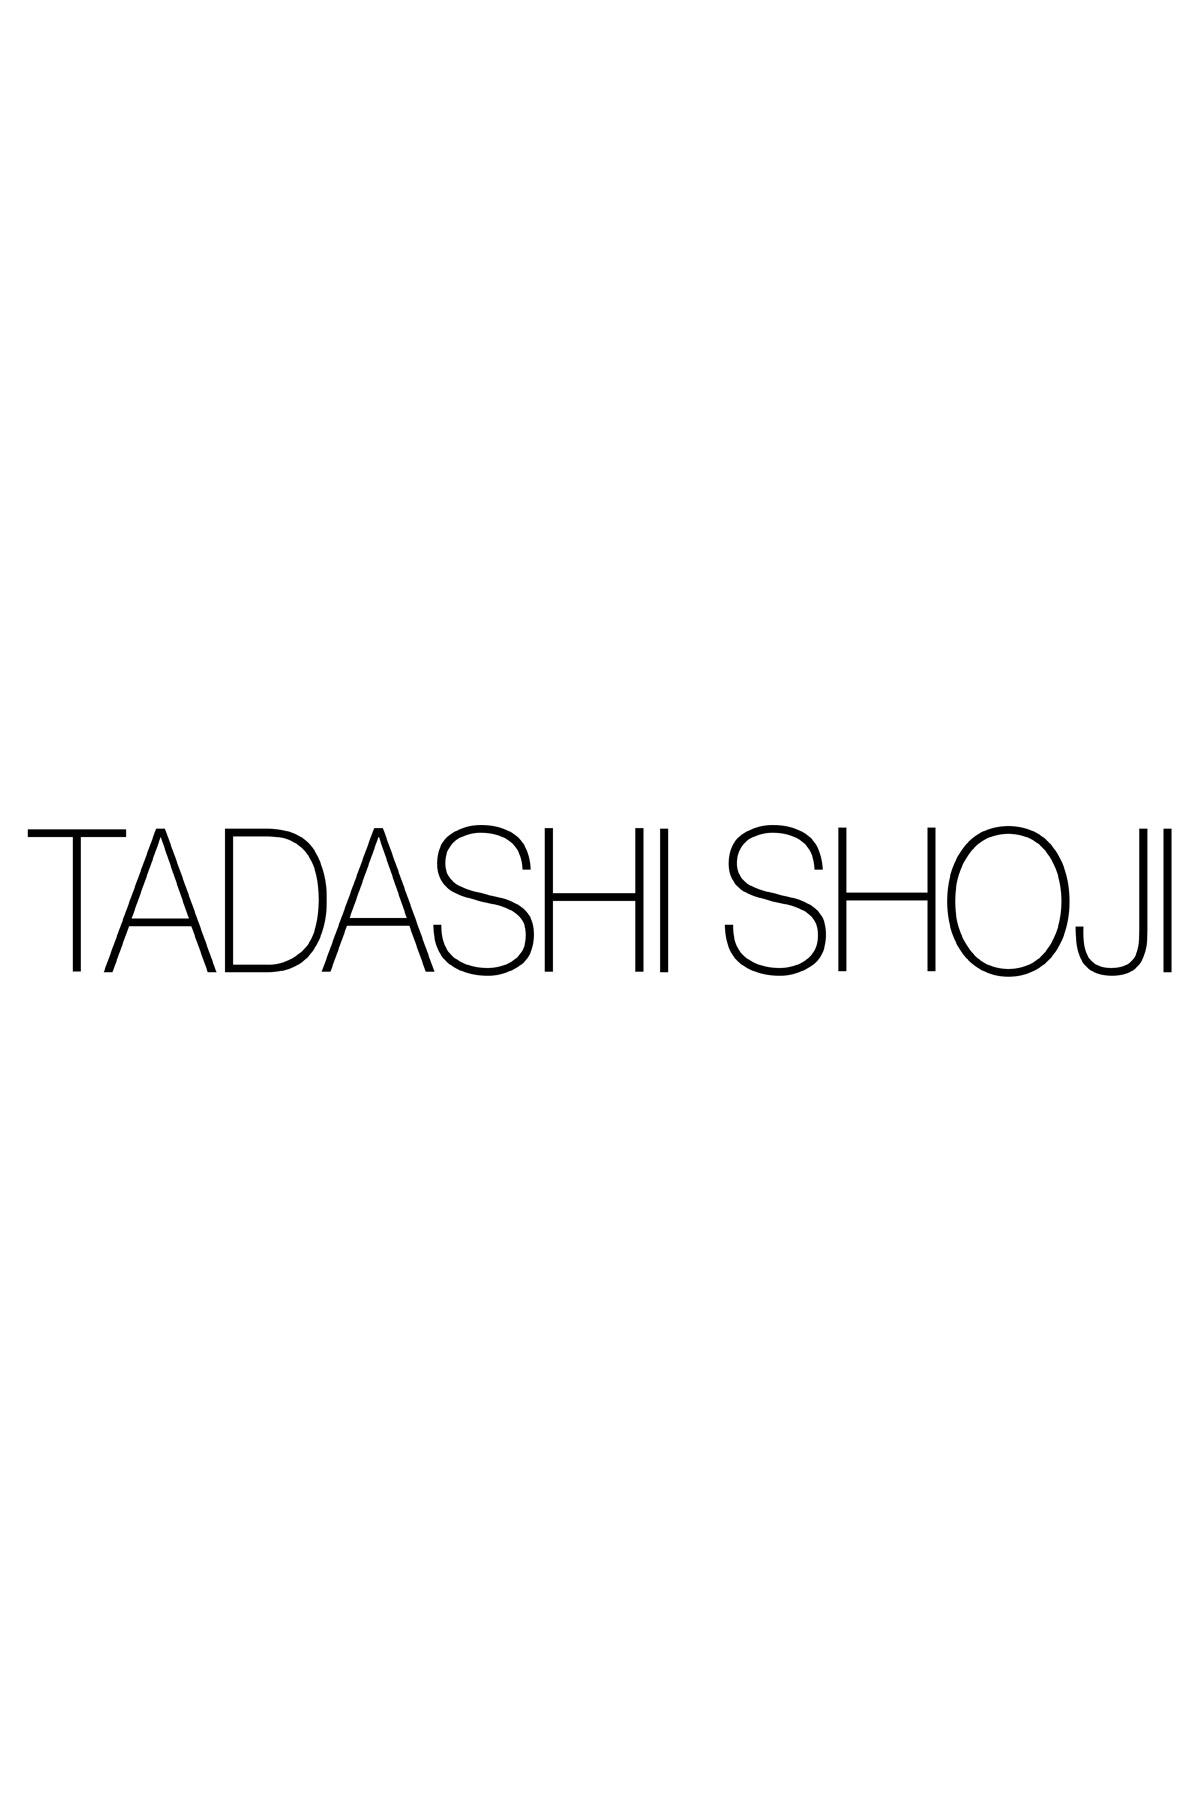 9aebf912b4c1 Evening Gowns | Evening Dresses | Tadashi Shoji